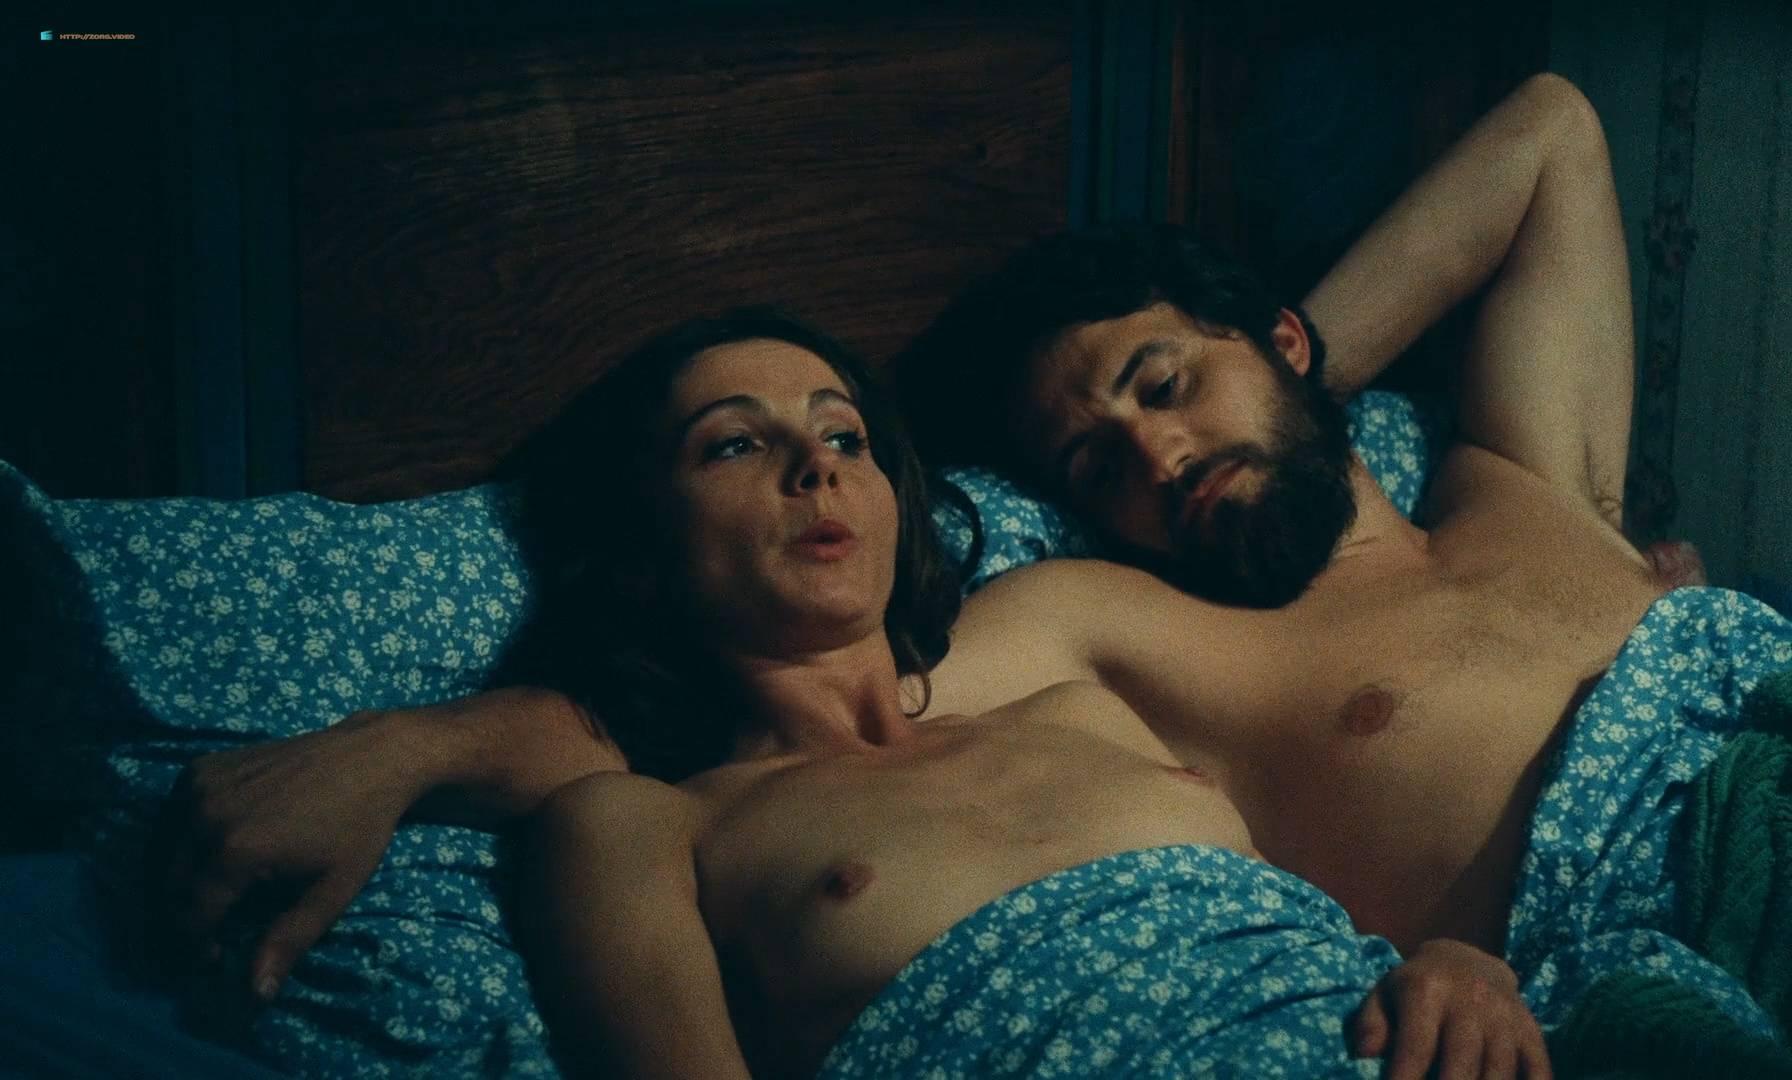 Thérèse Liotard nude topless and Valérie Mairesse nude full frontal - L' une chante, l'autre pas (FR-1977) HD 1080p (2)